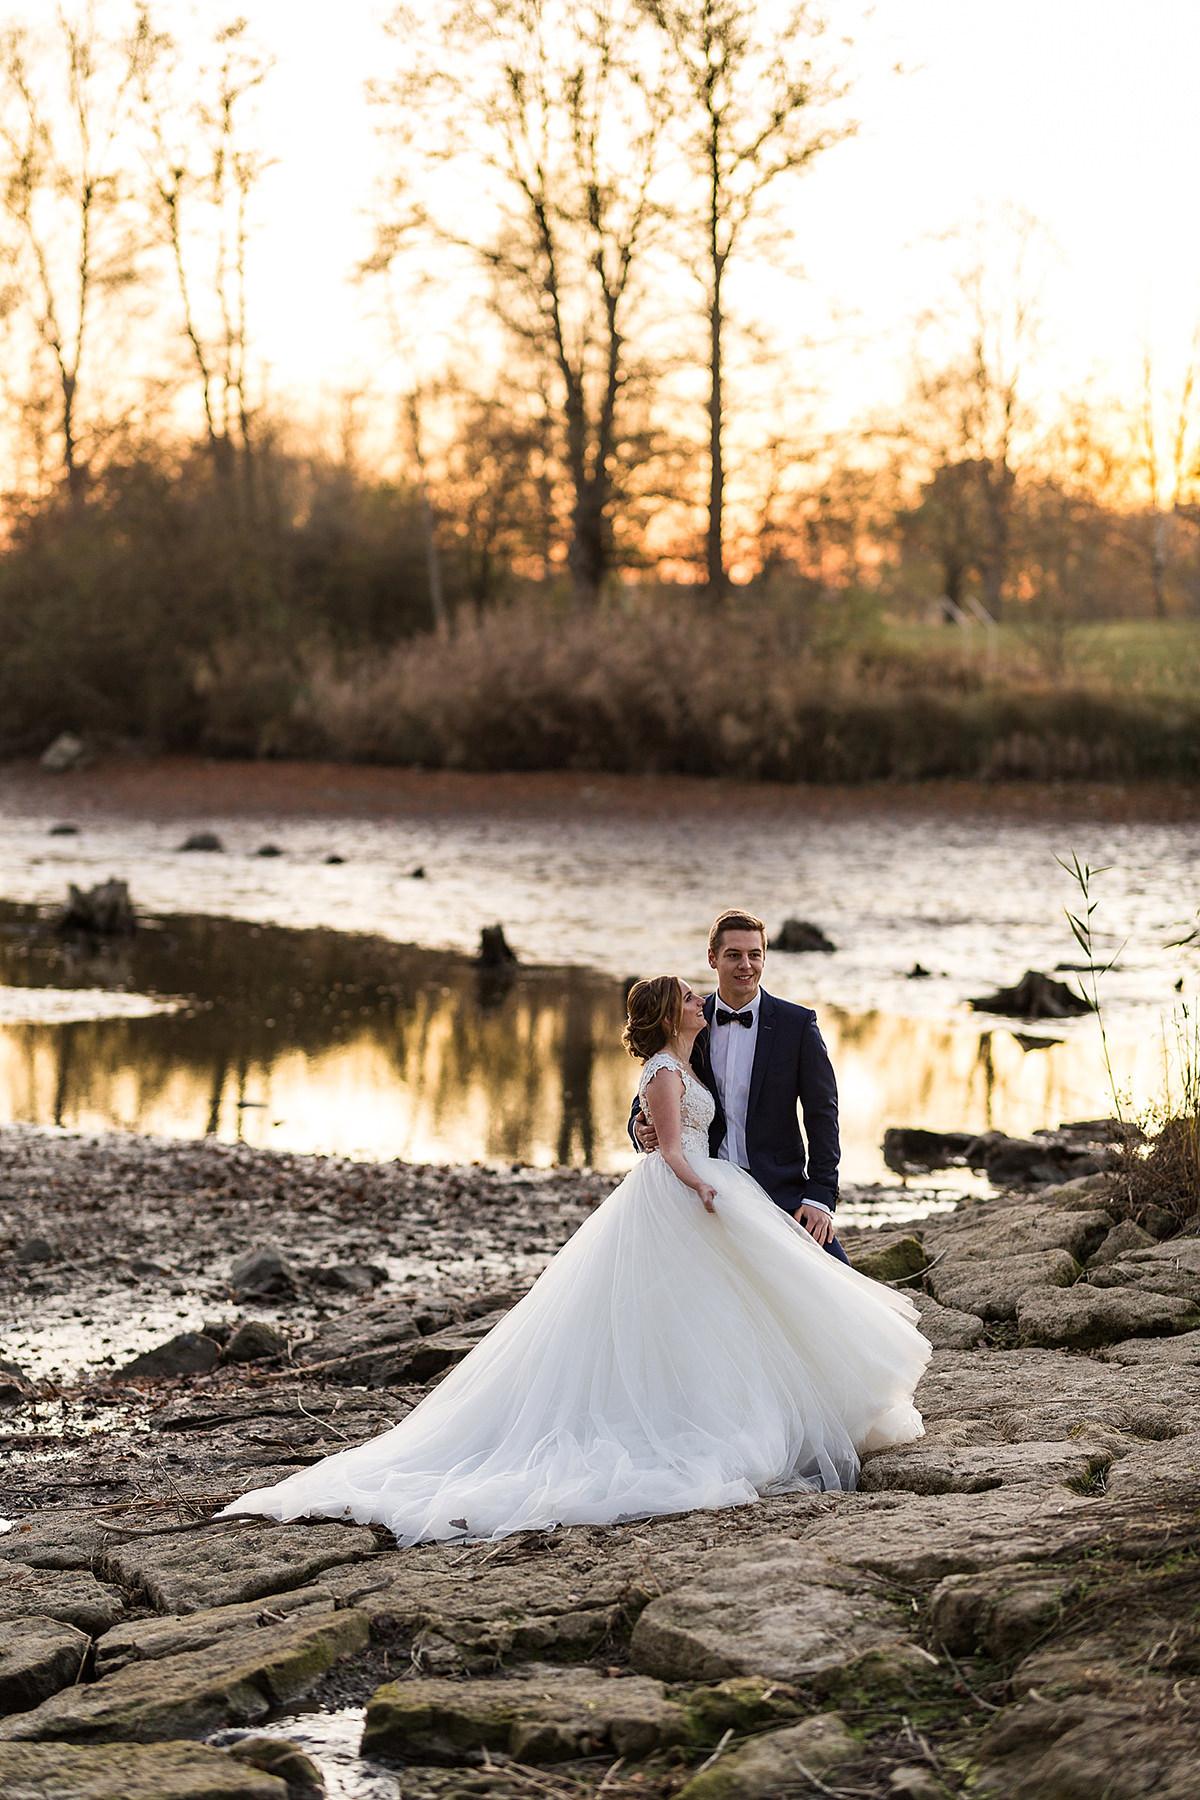 Romantisches After-Wedding-Shooting im Herbst am Degenbachsee in Crailsheim